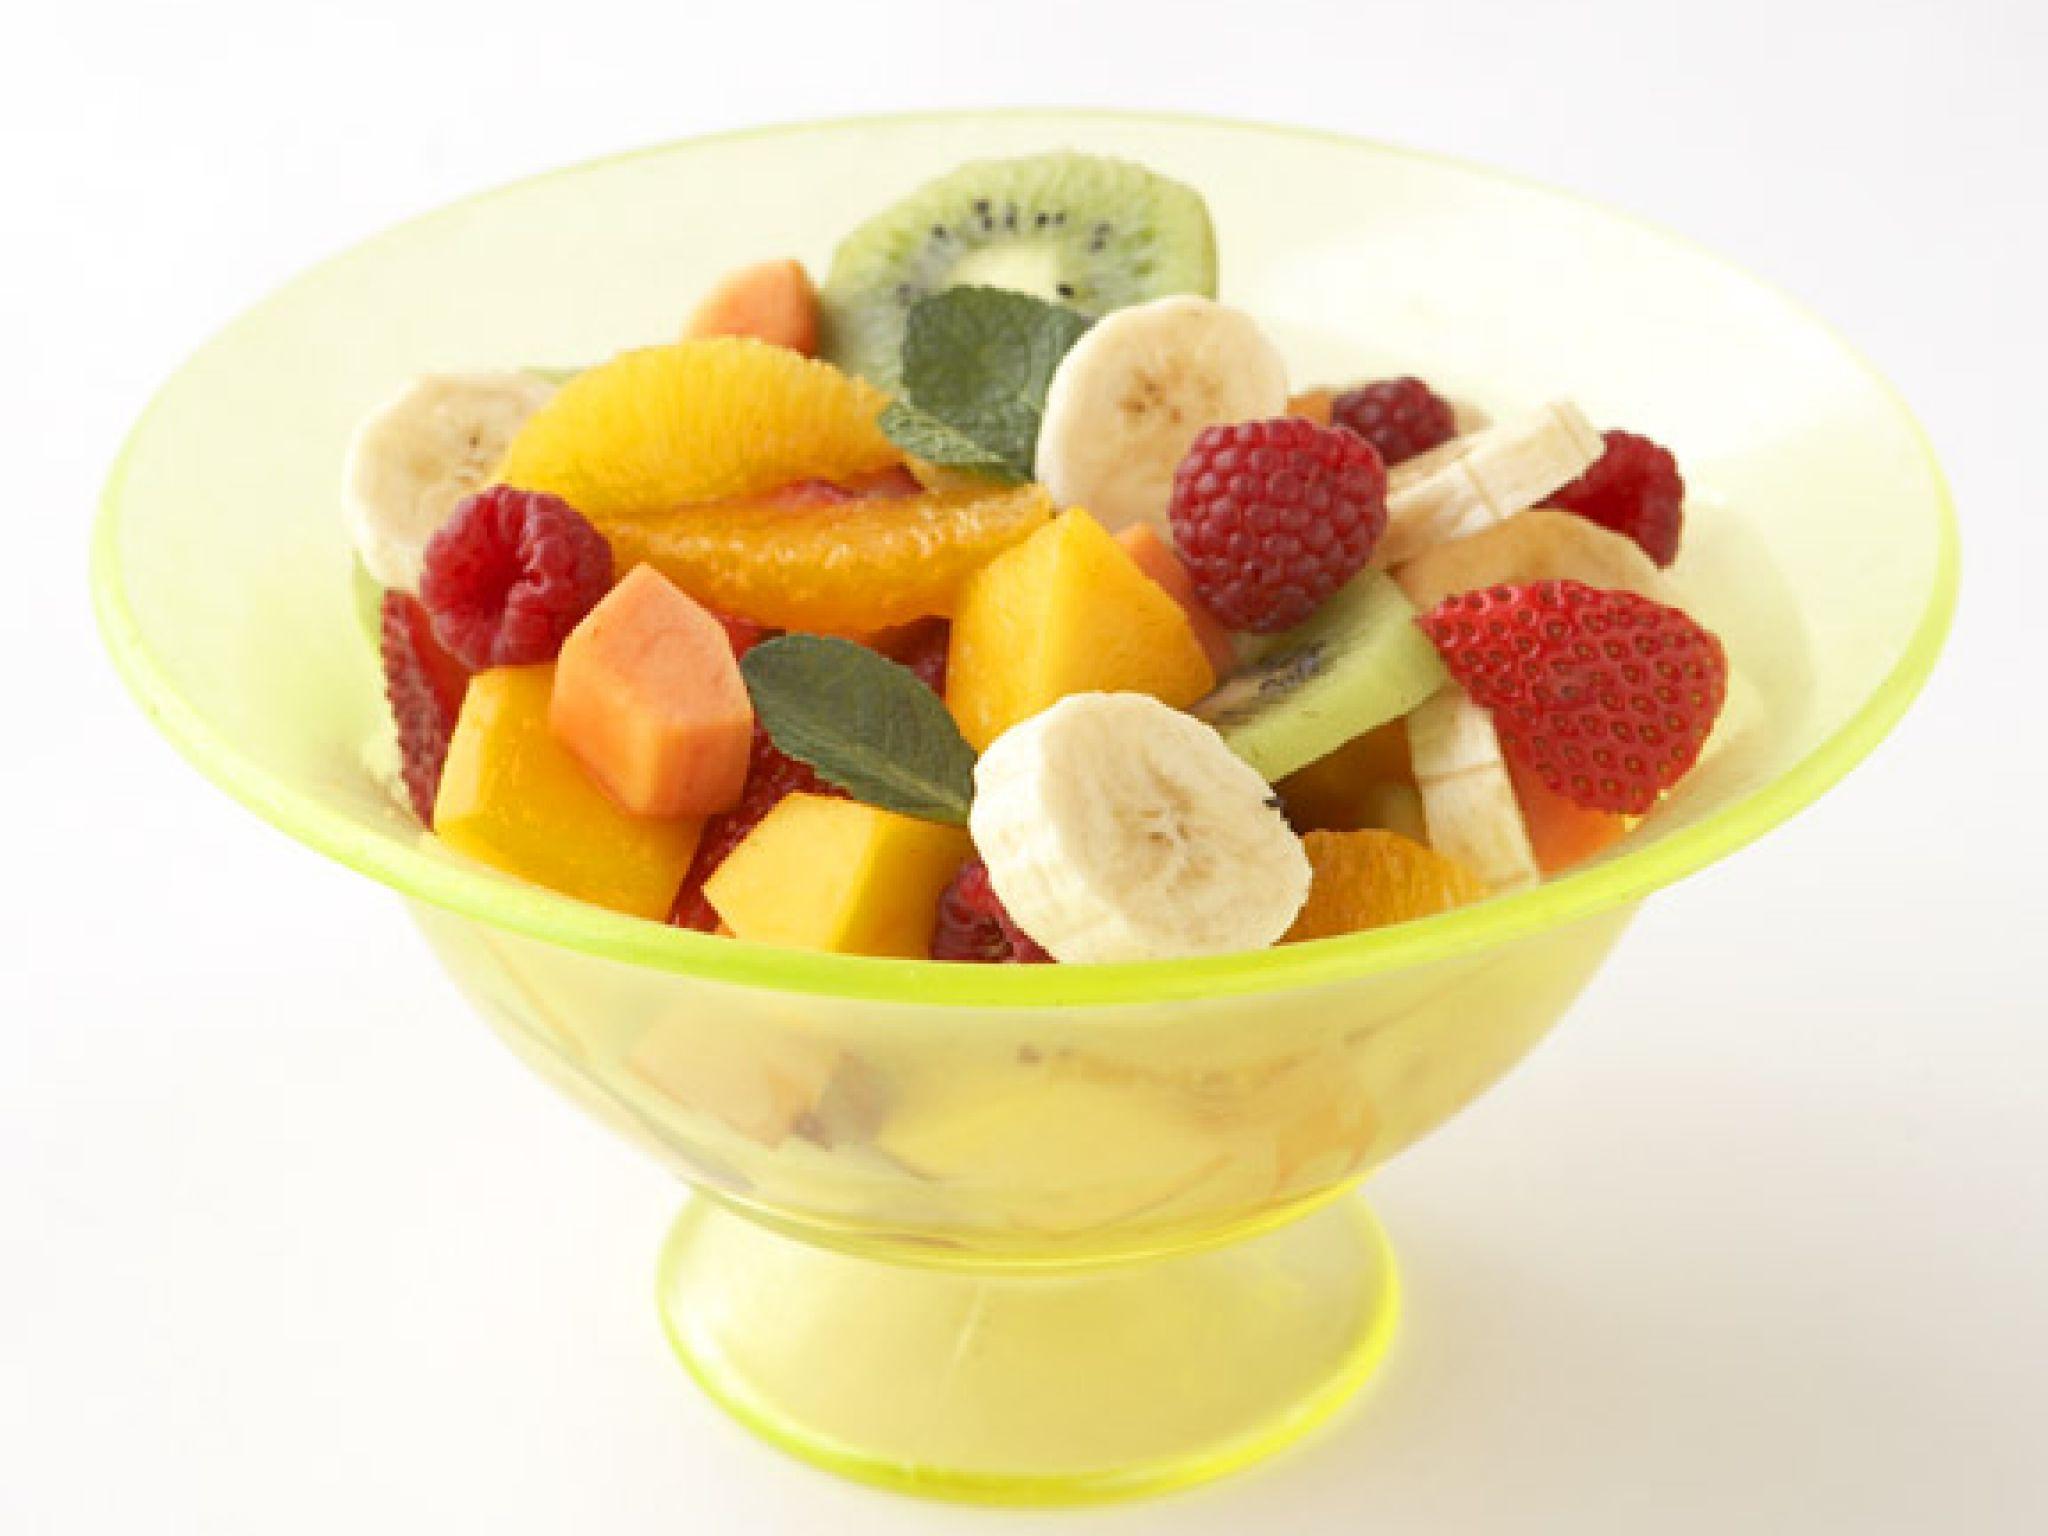 MD_FruitSalad.jpg.rend.sniipadlarge